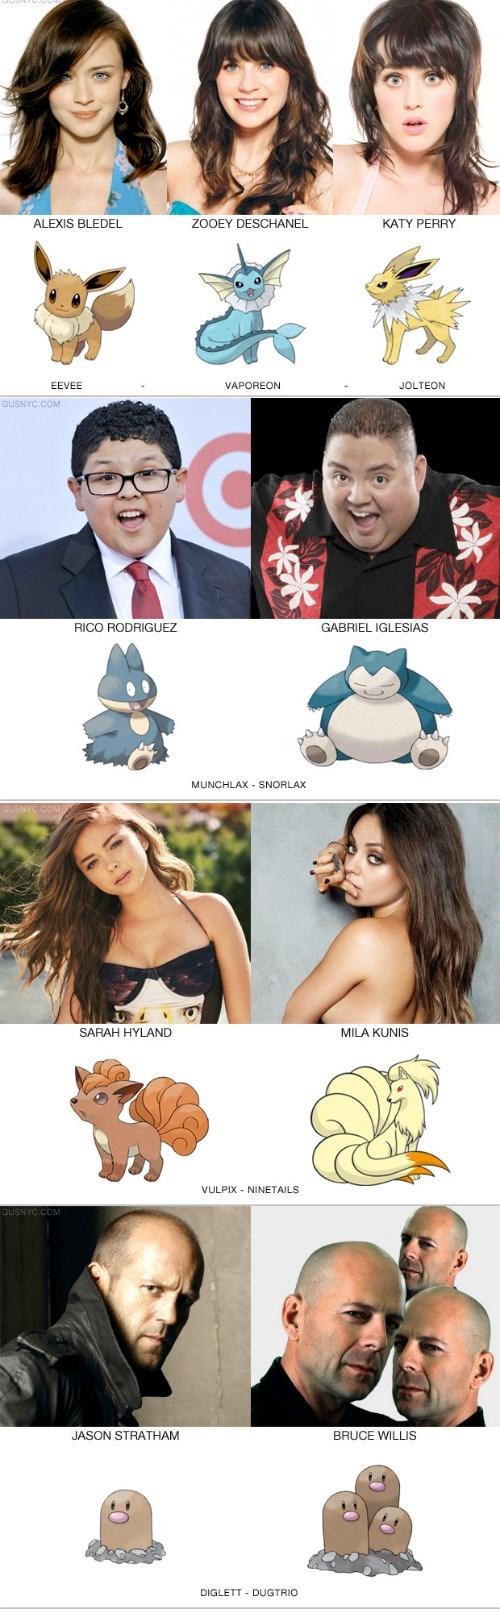 Pokémon katy perry mila kunis bruce willis pokemon evolutions zooey deschanel celeb - 8009150464